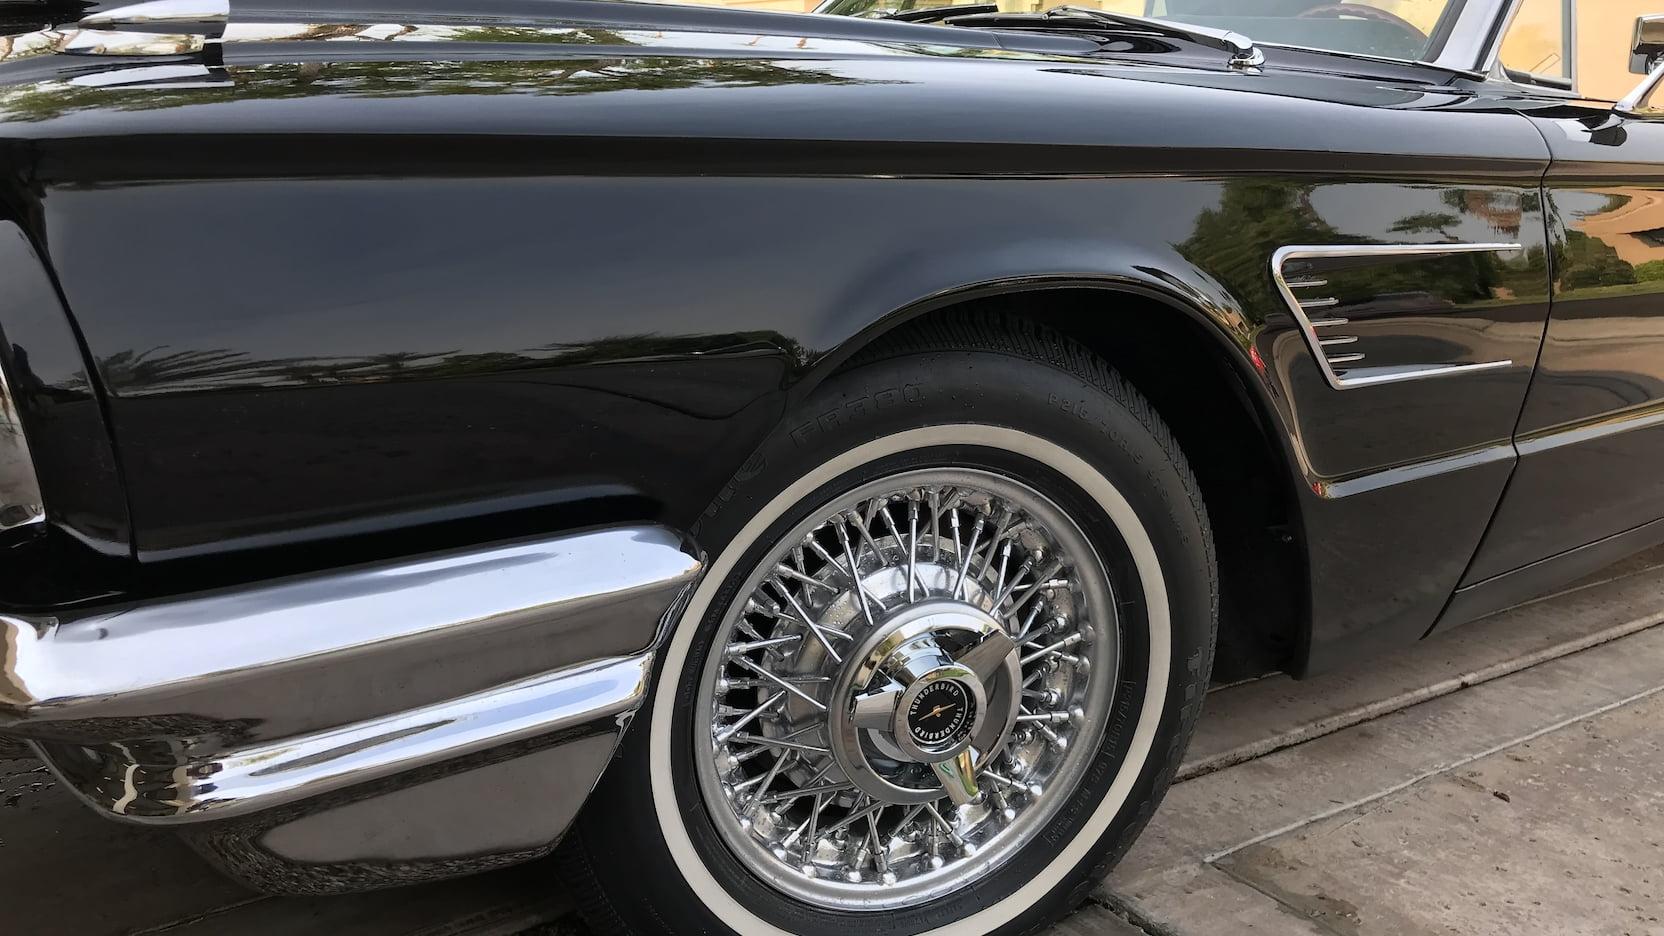 1965 Ford Thunderbird wheel detail